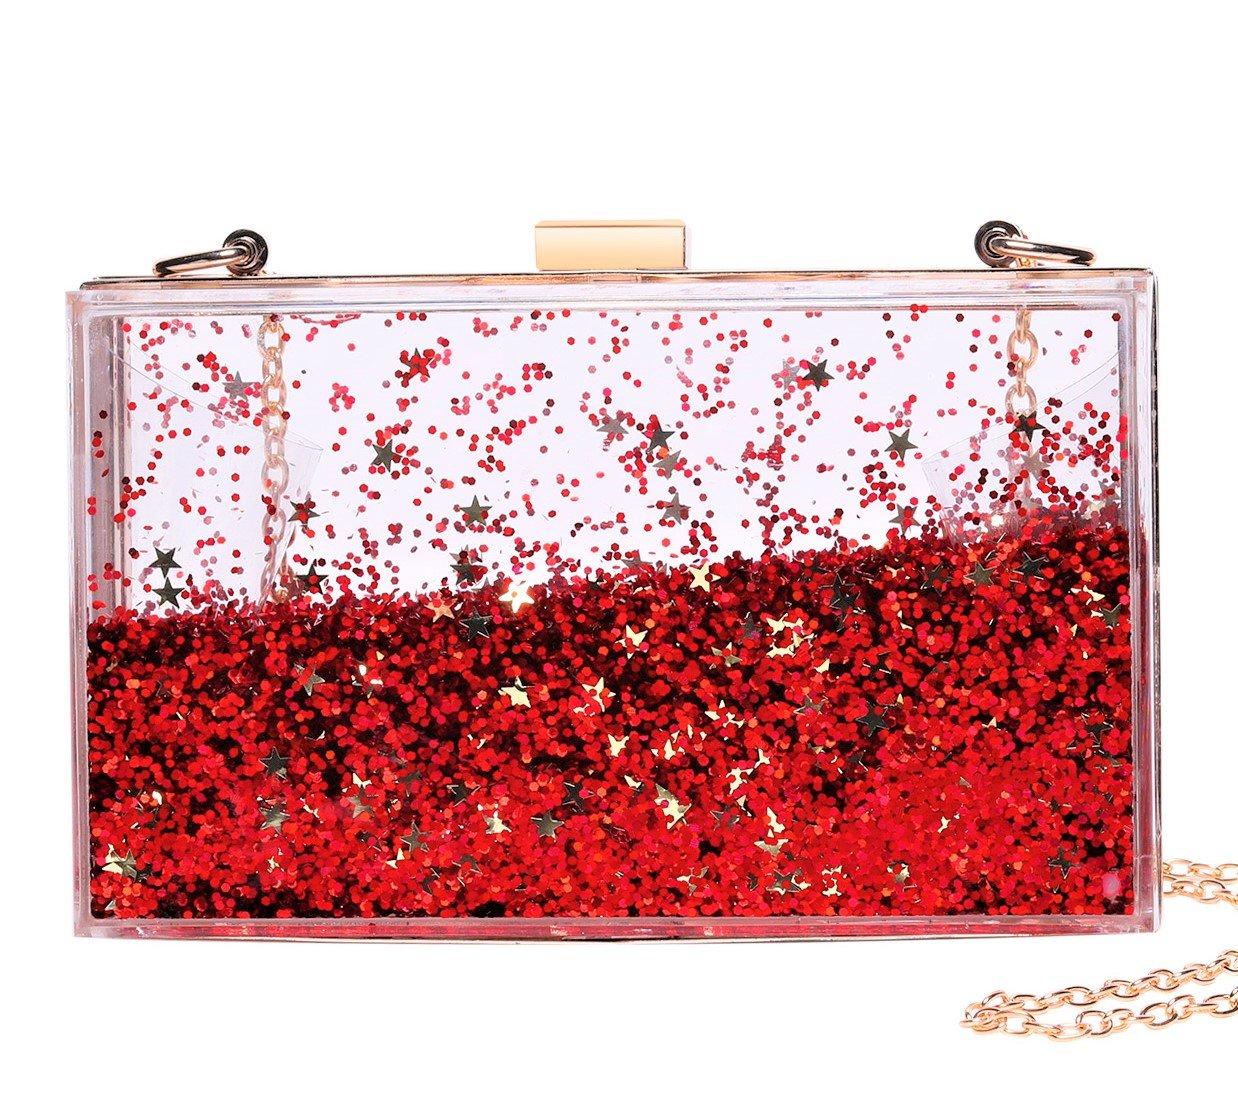 Jevenis Womens Transparent Sequins Chain Clutch Evening Handbag Party Cross-body Purse (Red)